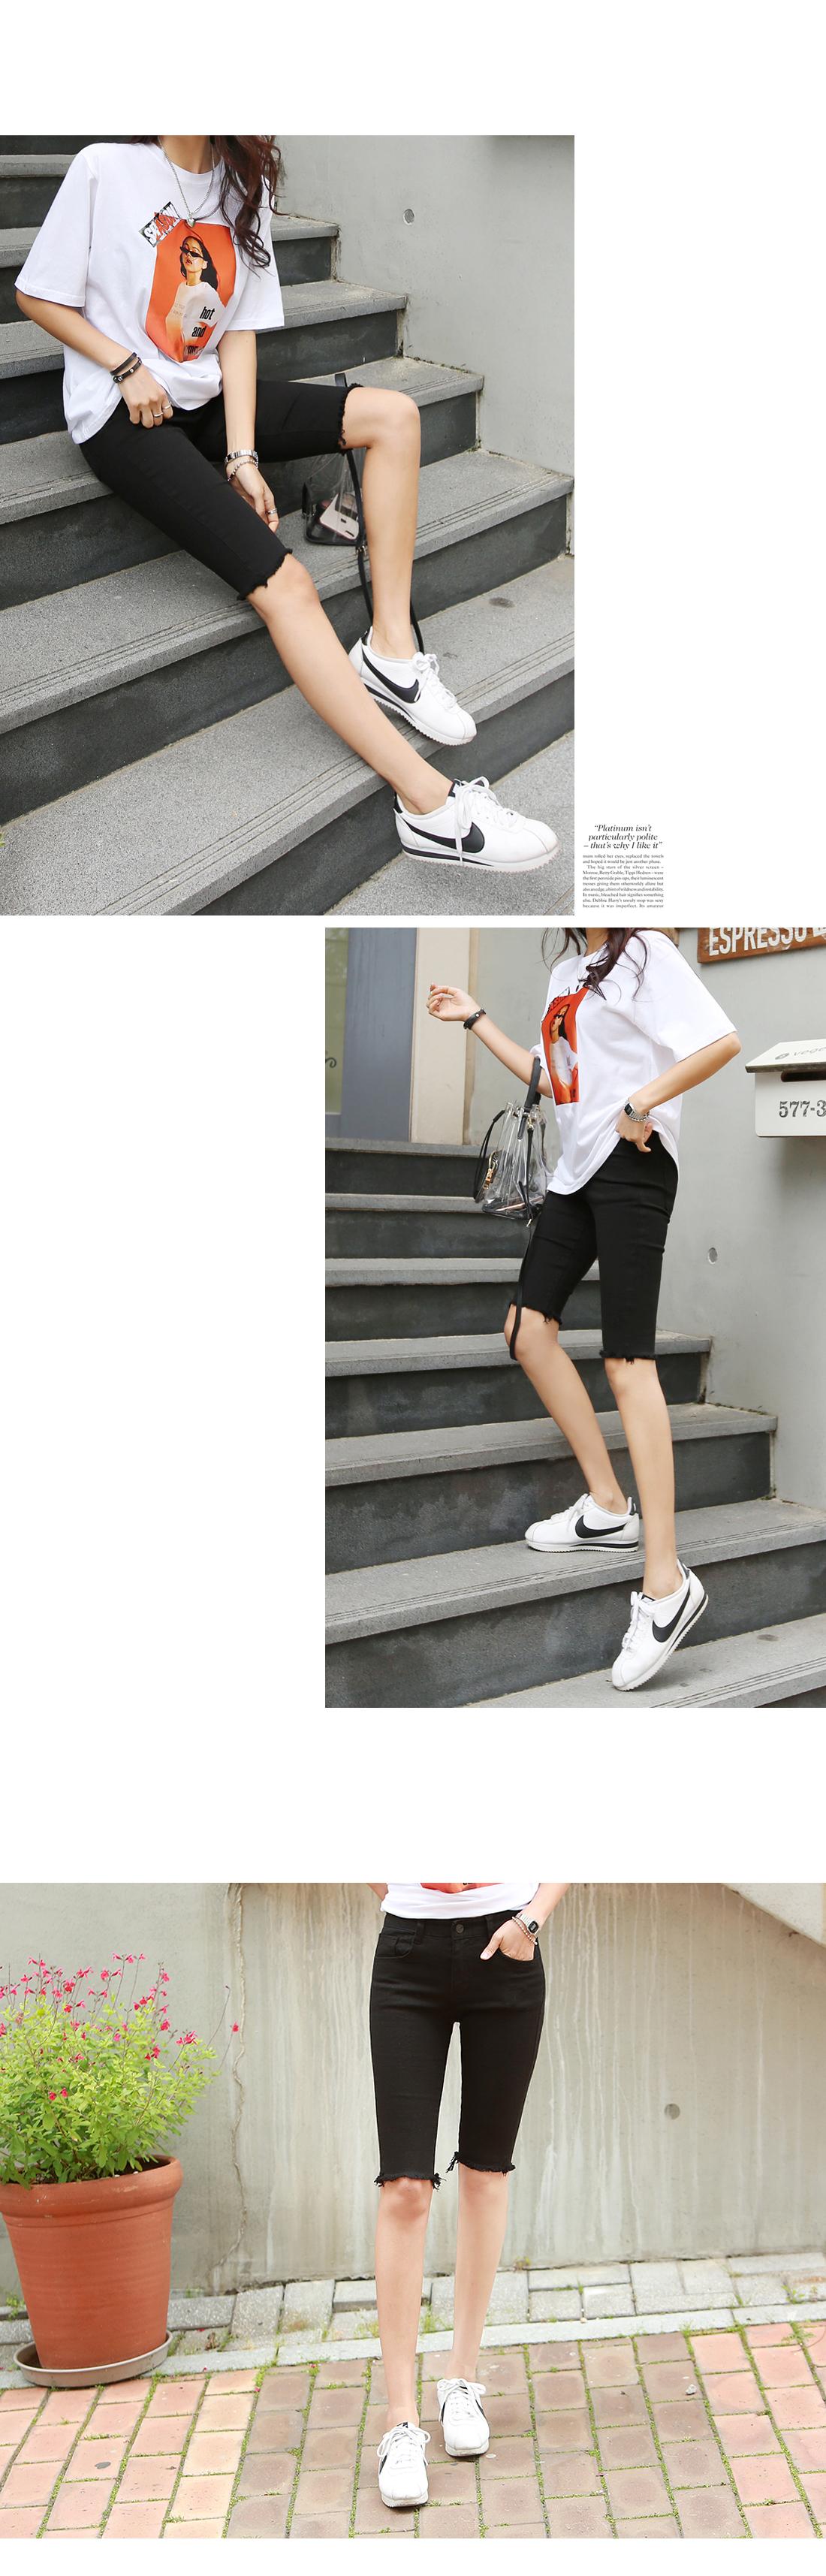 Tiel slim fit part 5 shorts #73738